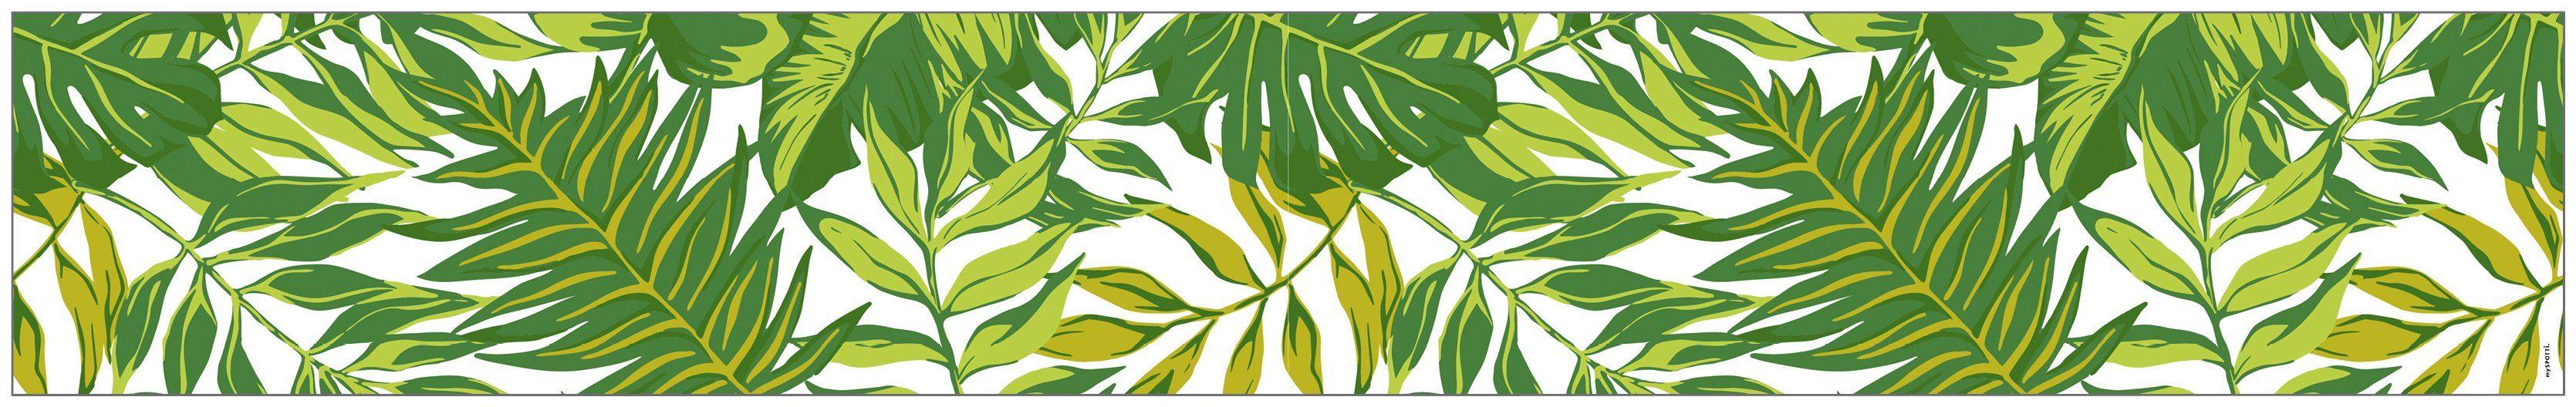 MYSPOTTI Fensterfolie »mySPOTTI look Palm Leaves green«, 200 x 30 cm, statisch haftend